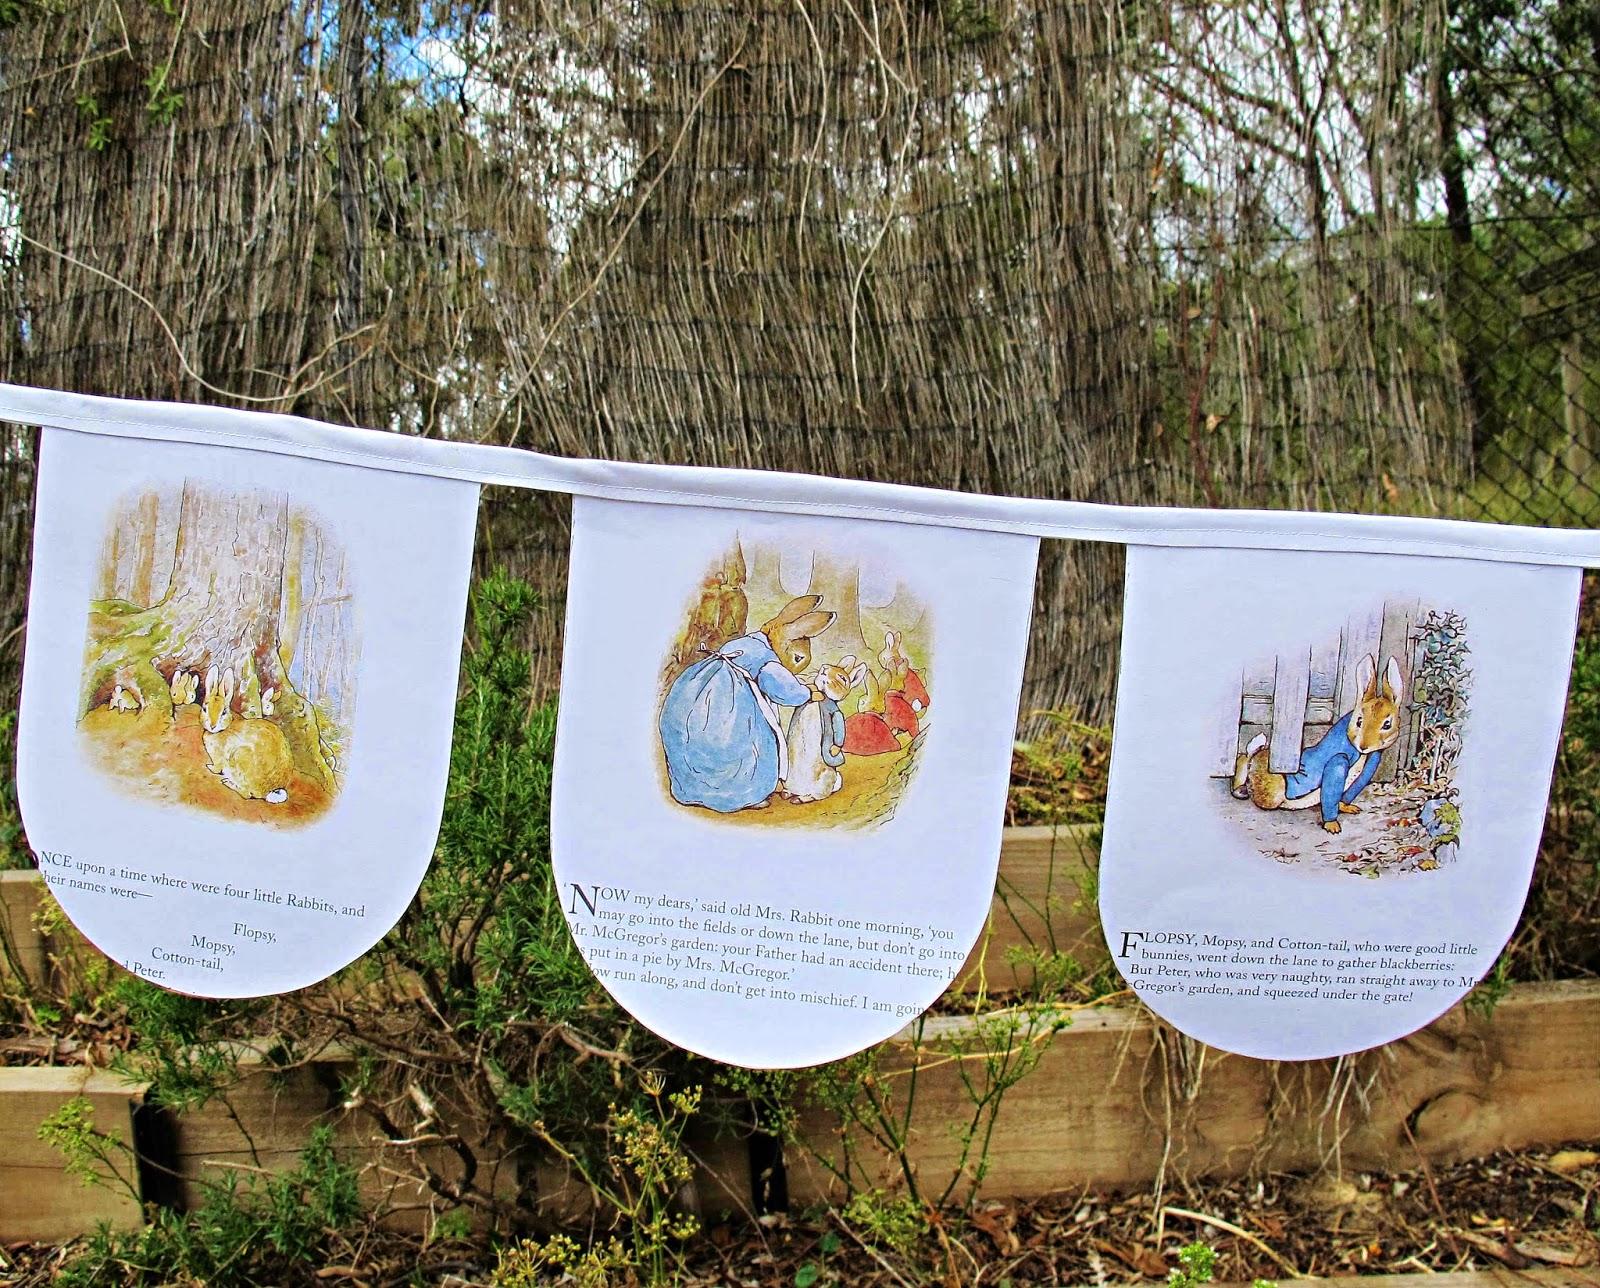 image peter rabbit bunting beatrix potter the tale of peter rabbit domum vindemia